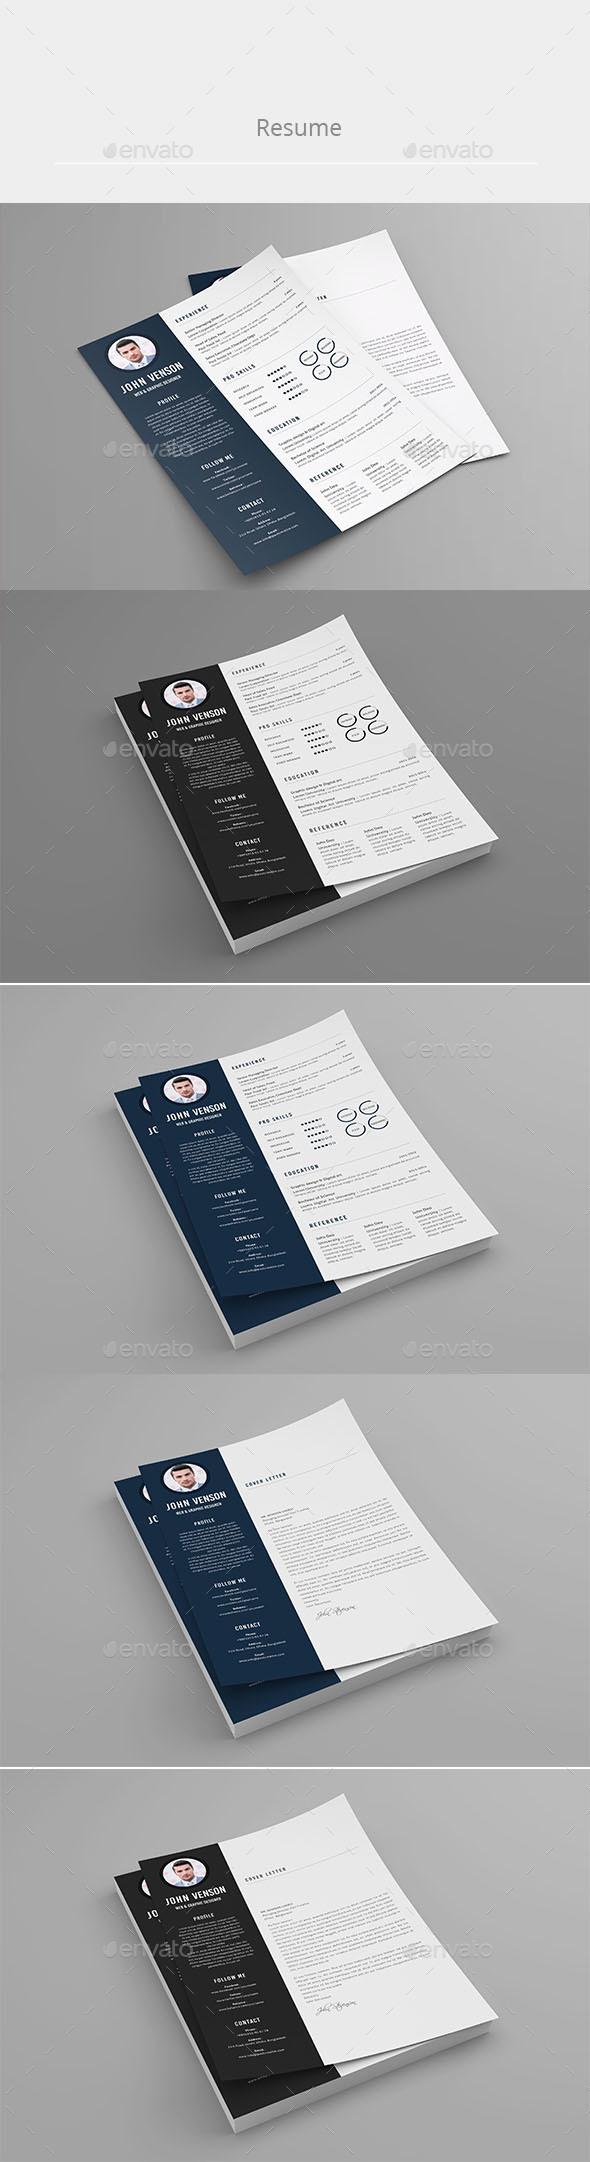 Resume template(John Stevenson 2) - #Resumes Stationery Download ...